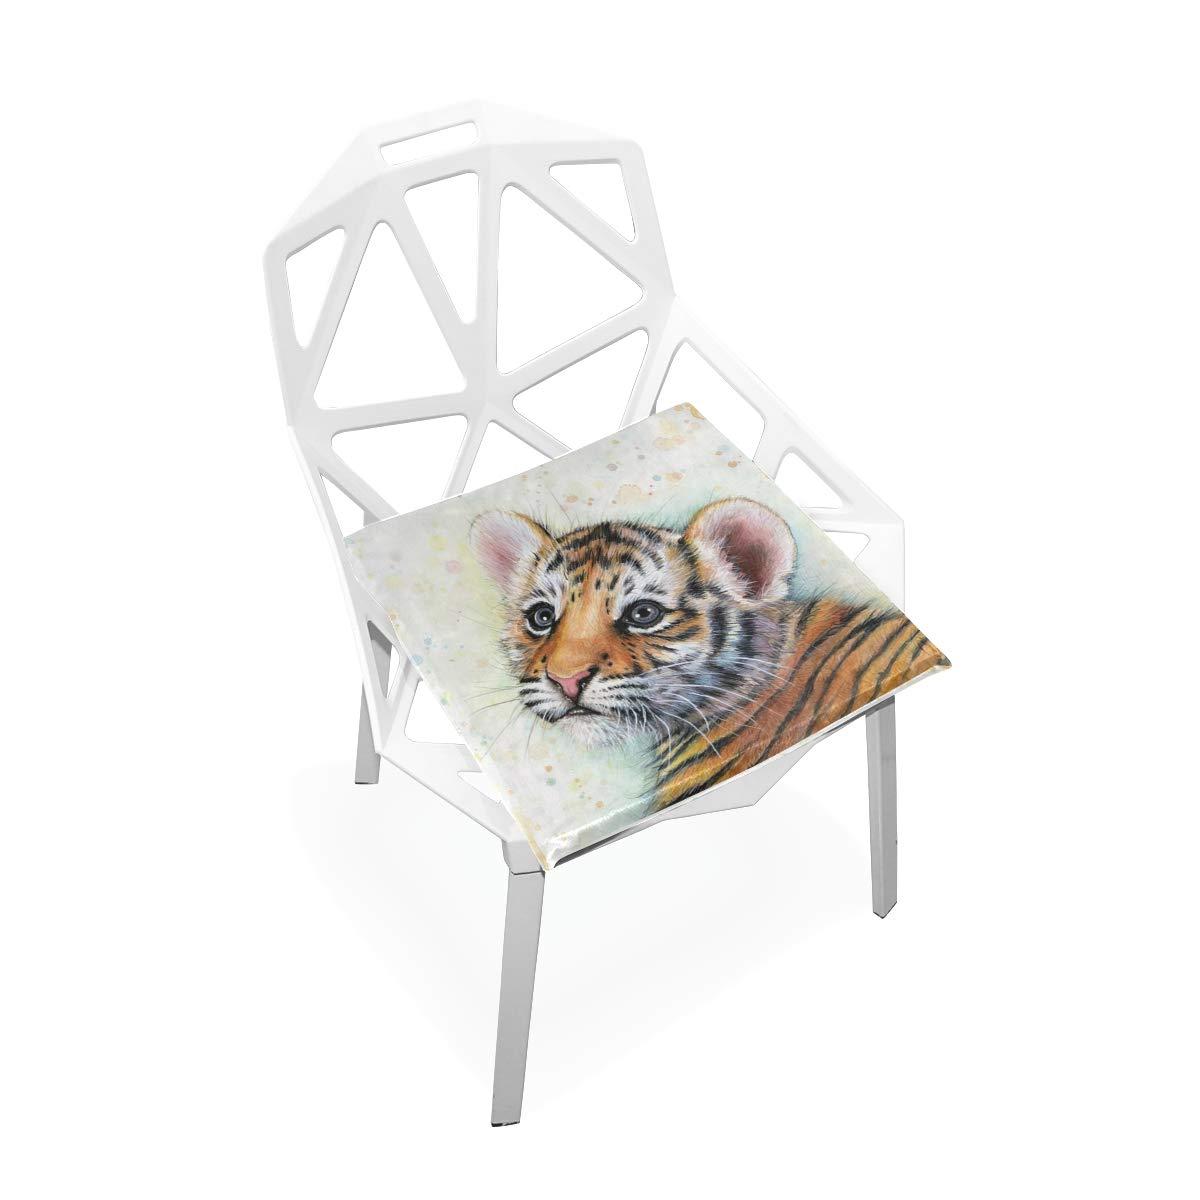 YOHHOY Premium Comfort Seat Cushion Tiger Watercolor Baby Animals Non-Slip Orthopedic Memory Foam Cushion for Tailbone Pain – Office Chair Car Seat Cushion